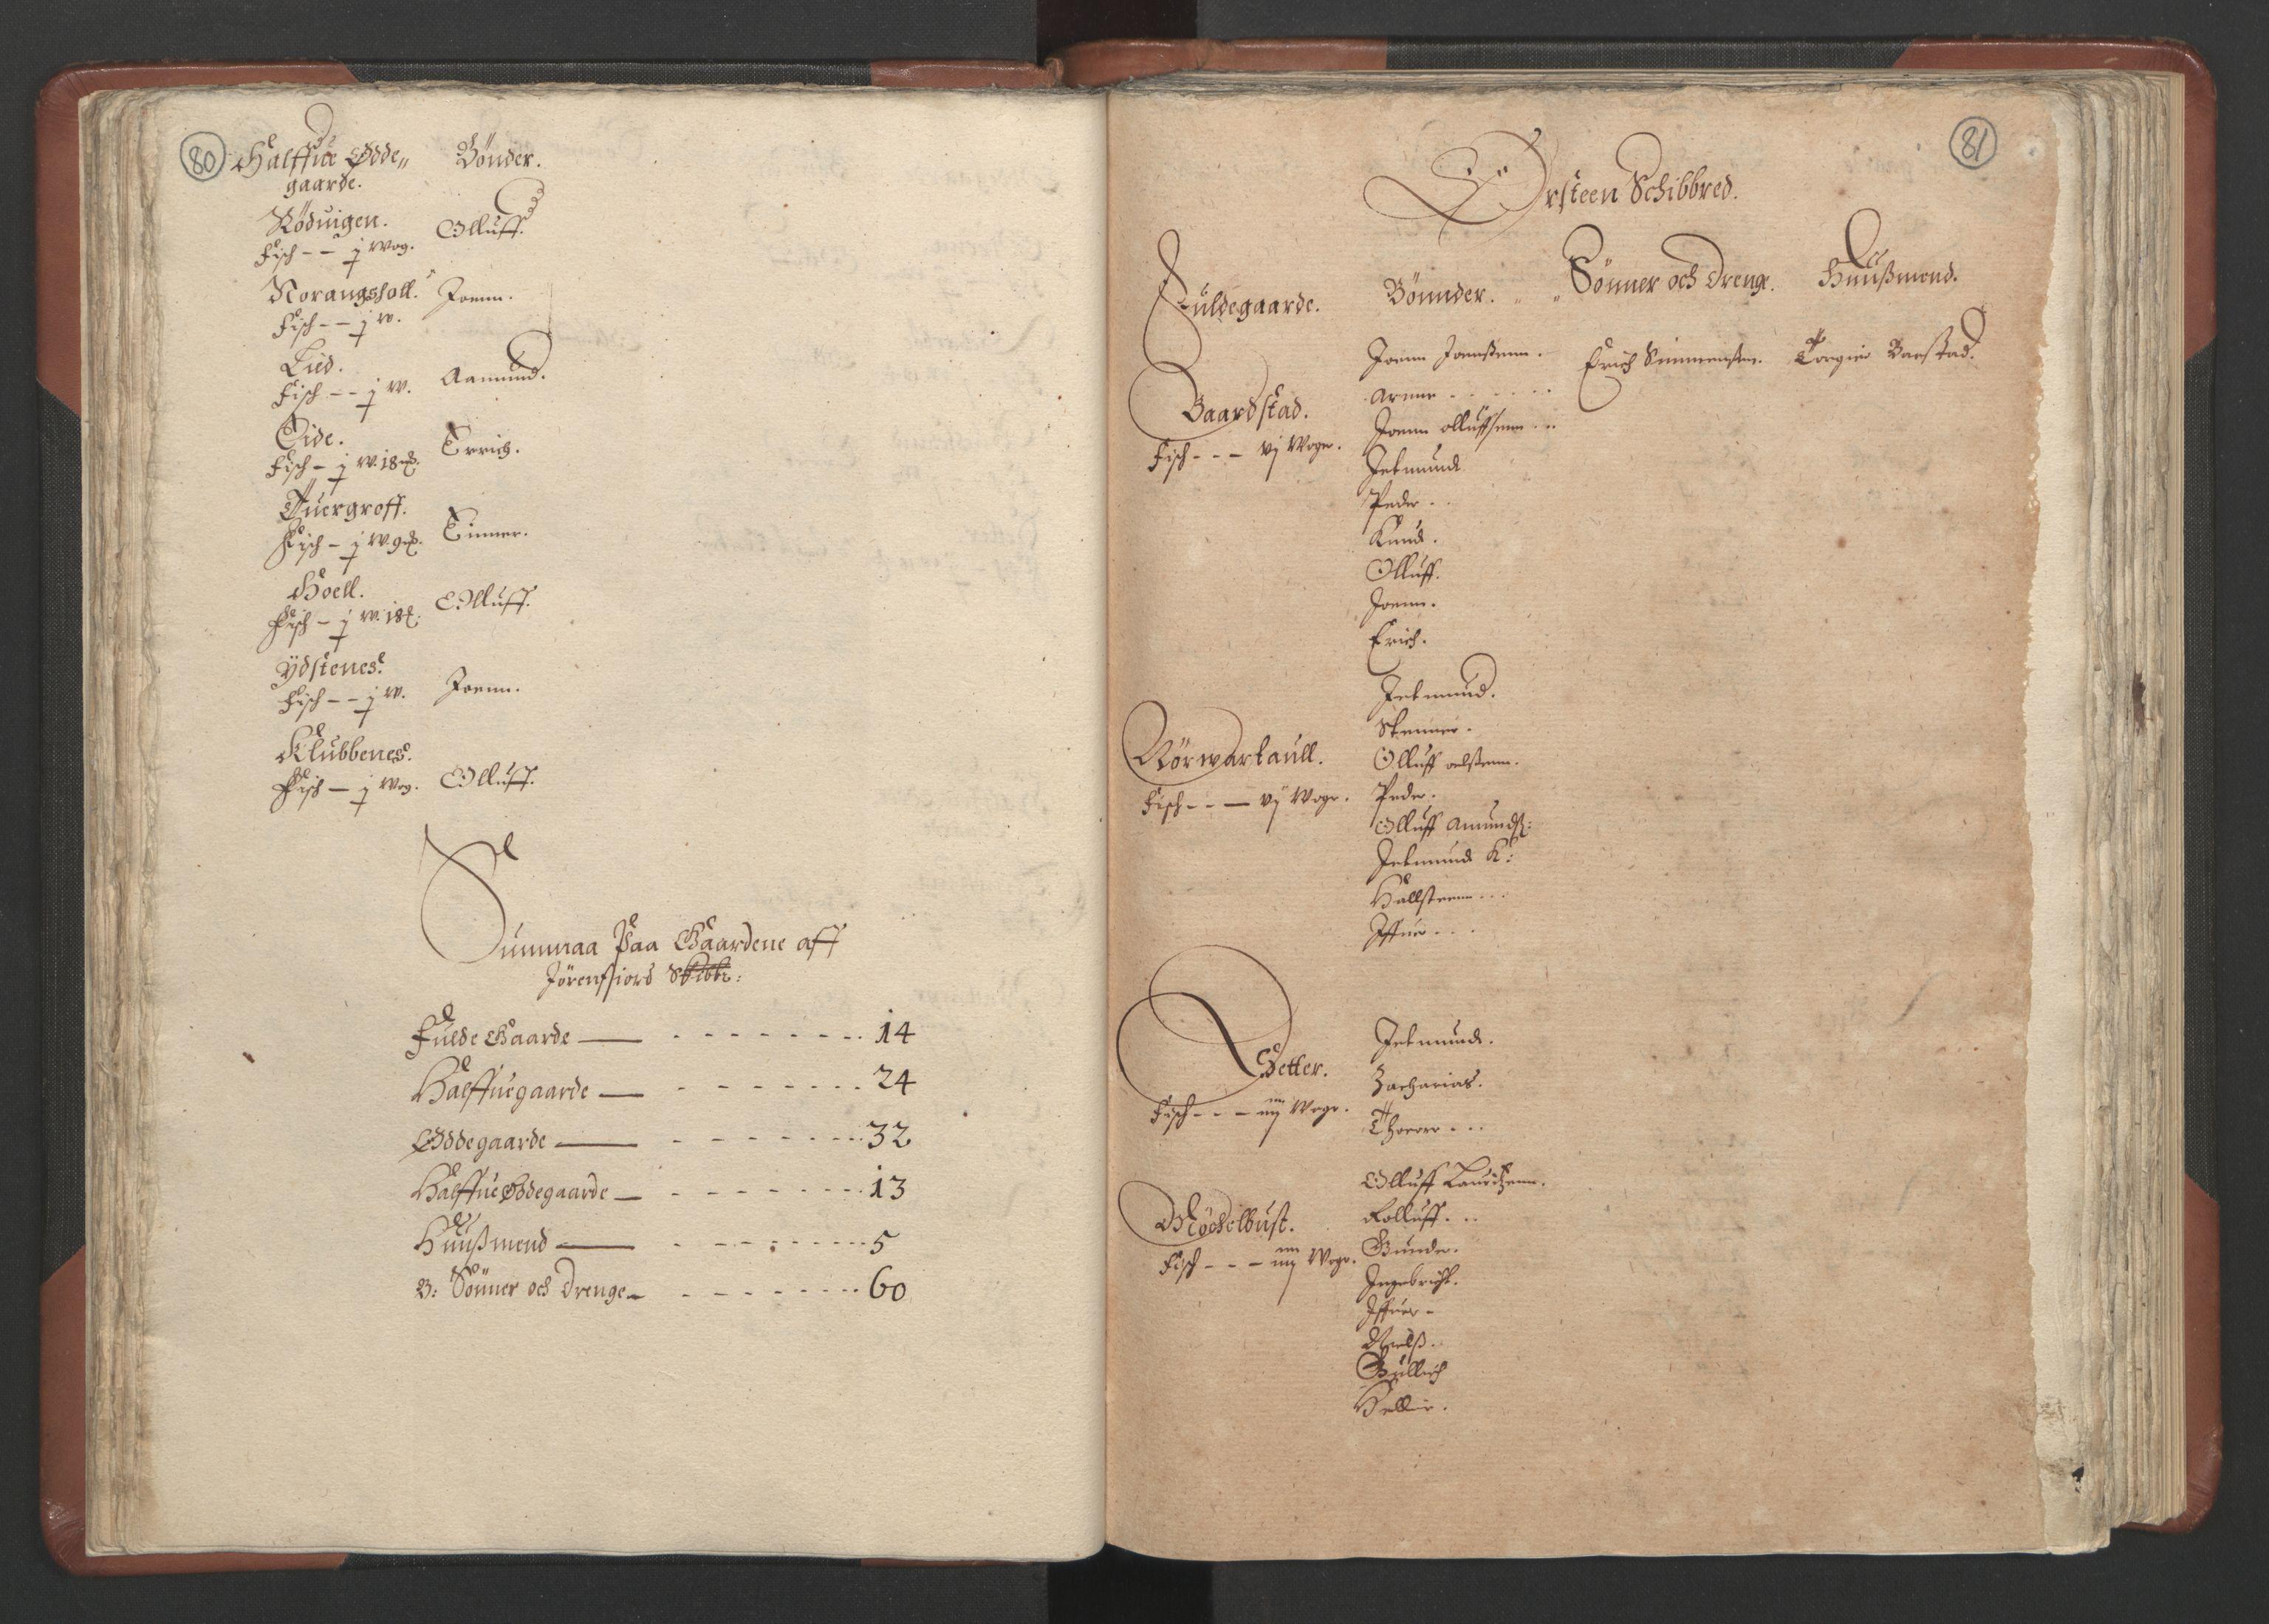 RA, Fogdenes og sorenskrivernes manntall 1664-1666, nr. 16: Romsdal fogderi og Sunnmøre fogderi, 1664-1665, s. 80-81